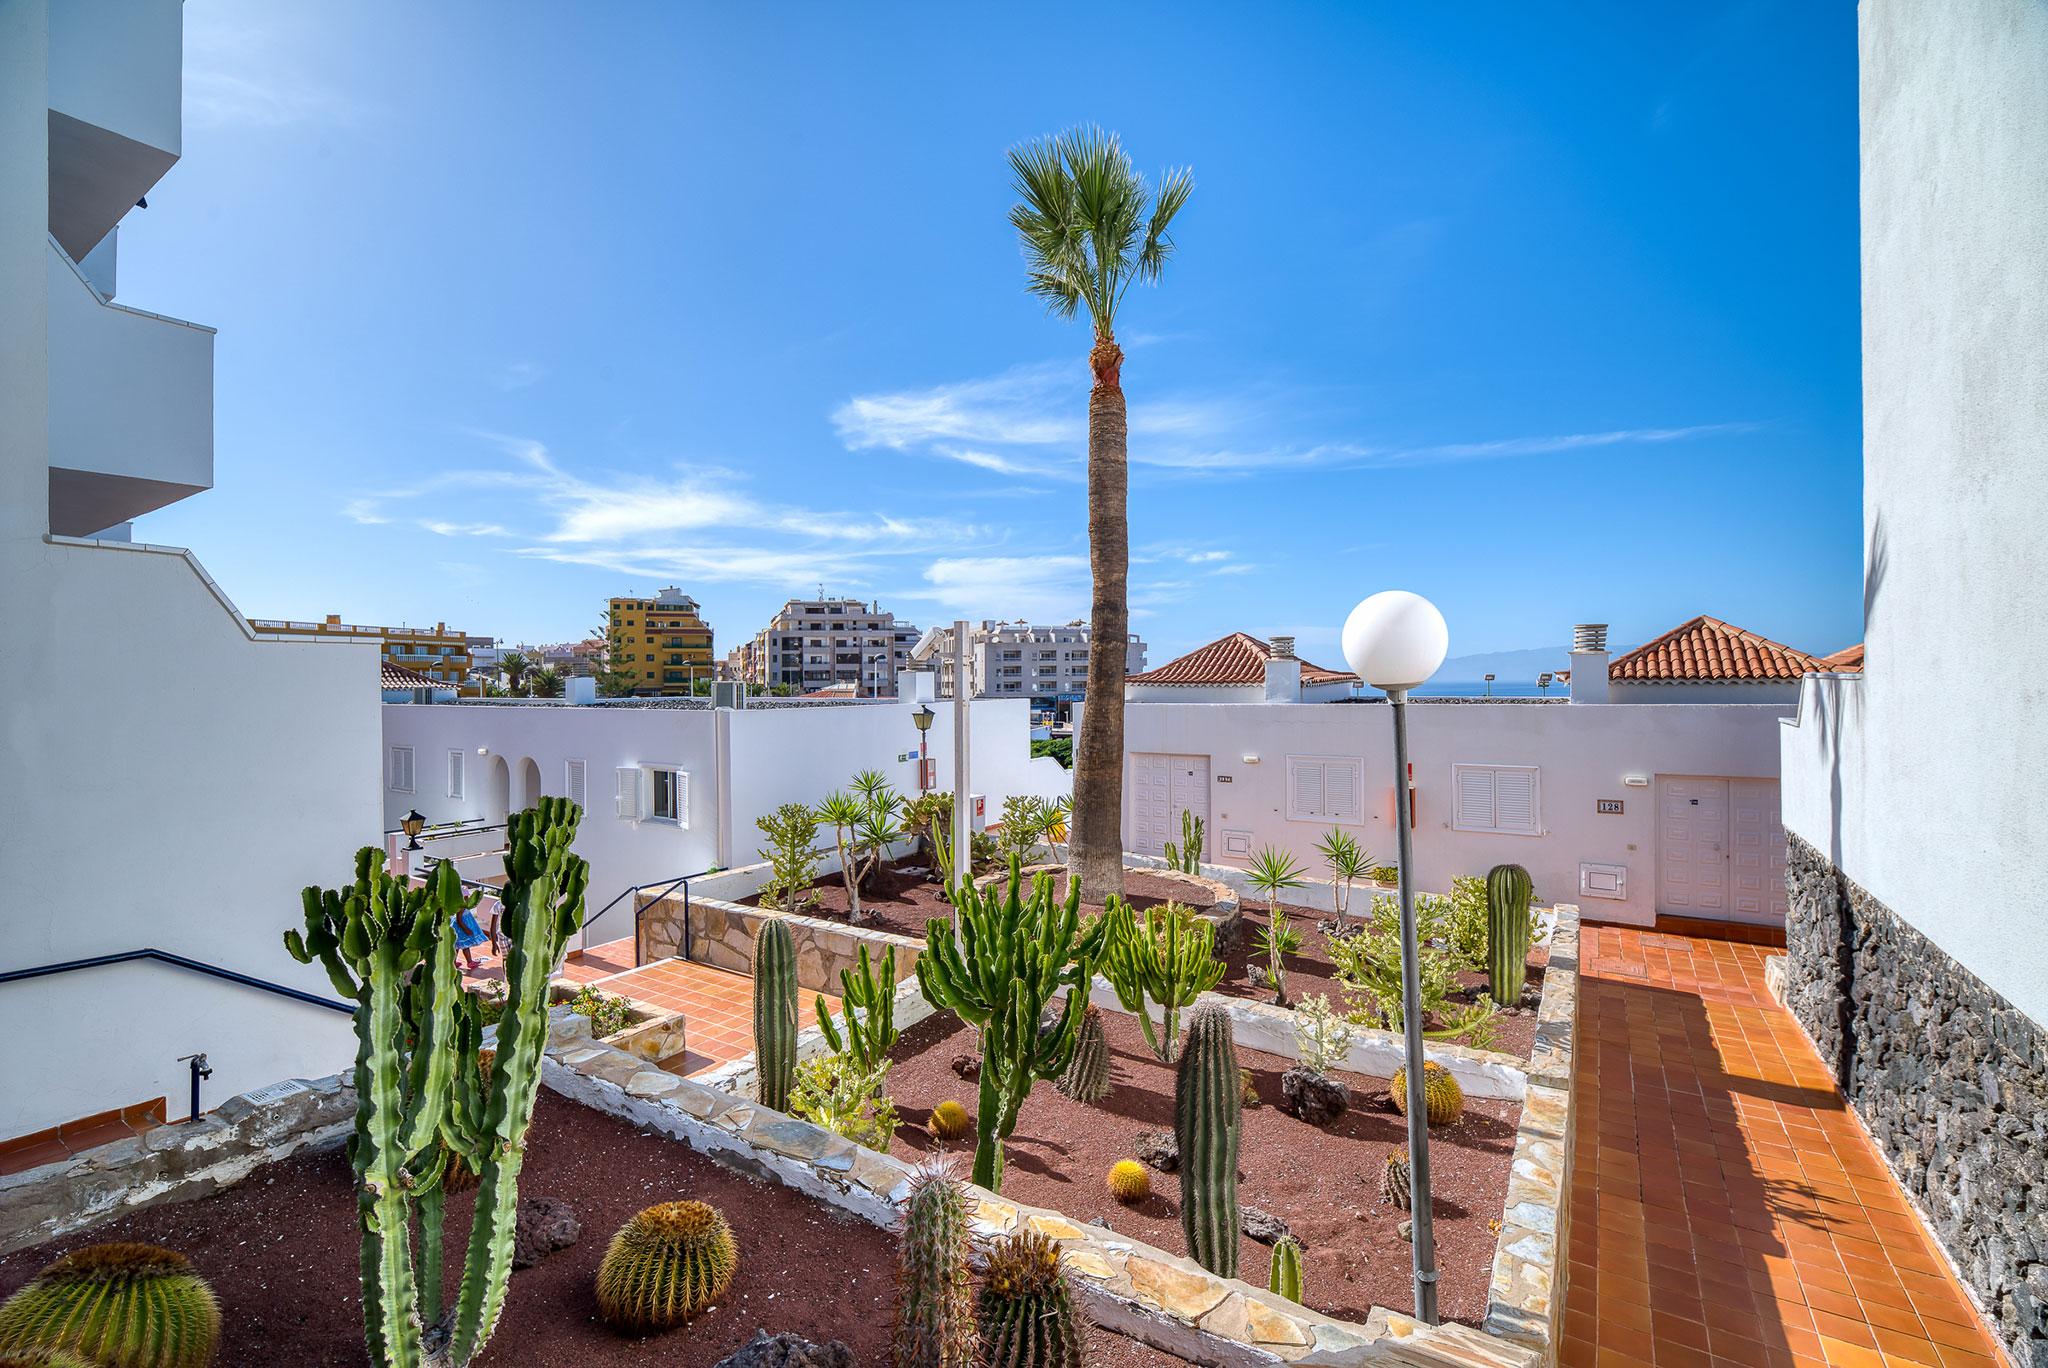 Hotel Marques Cactus Garden